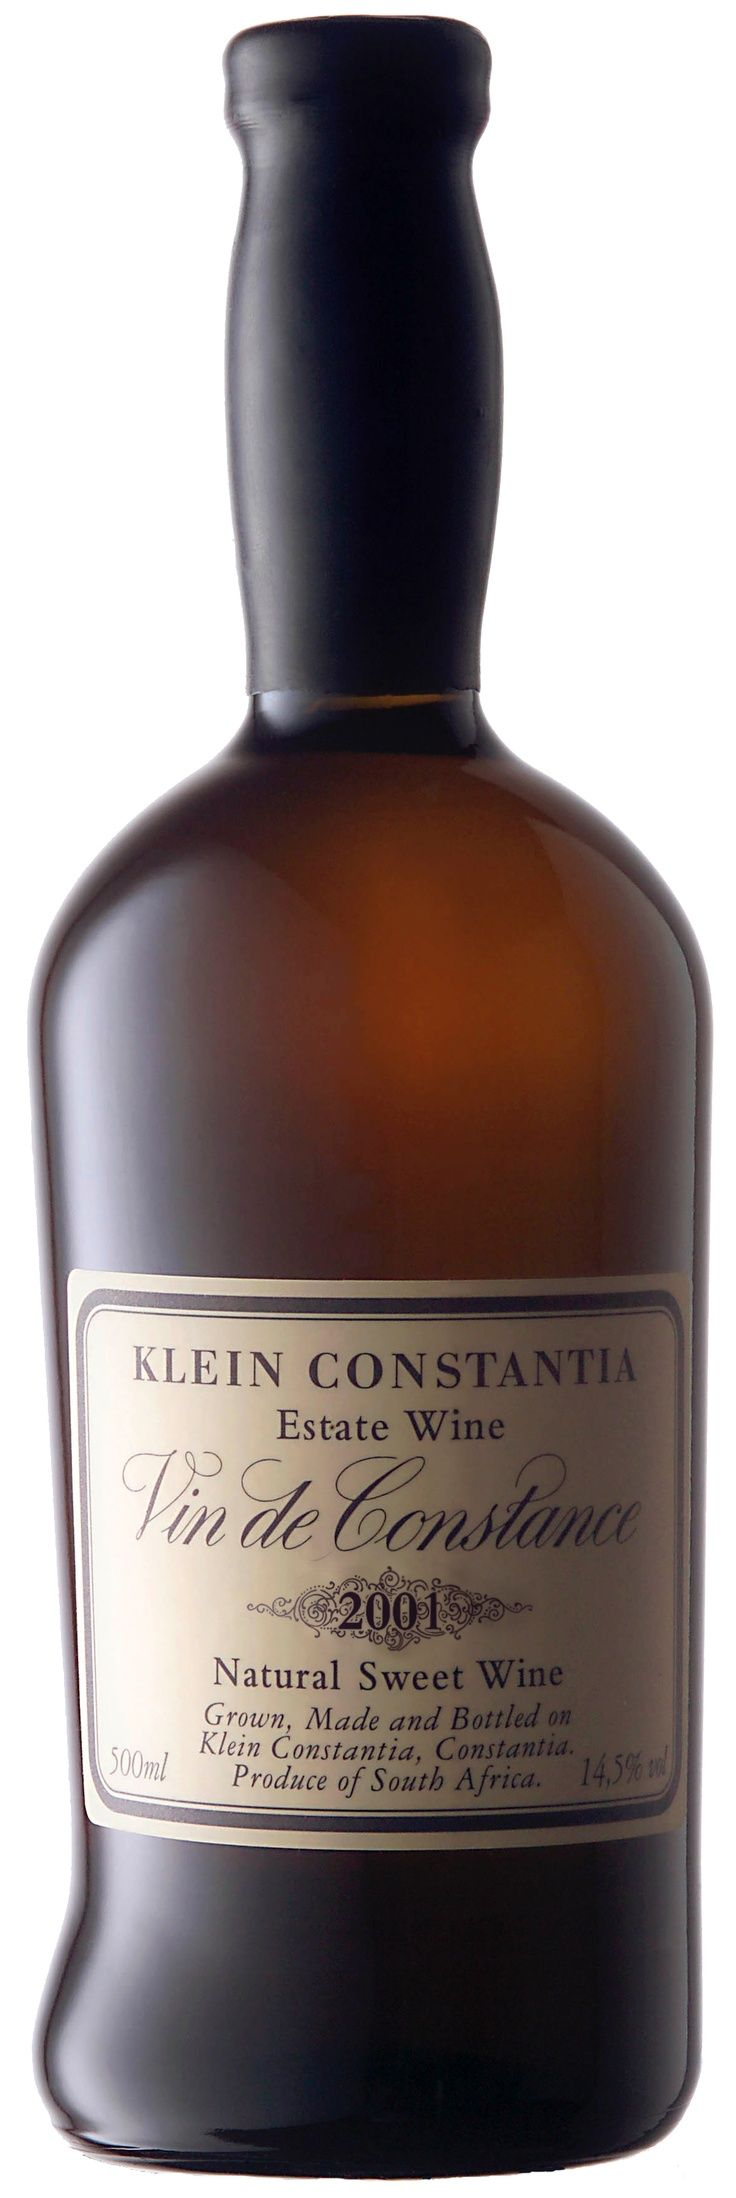 Image result for Old Groot Constantia Wine Bottle